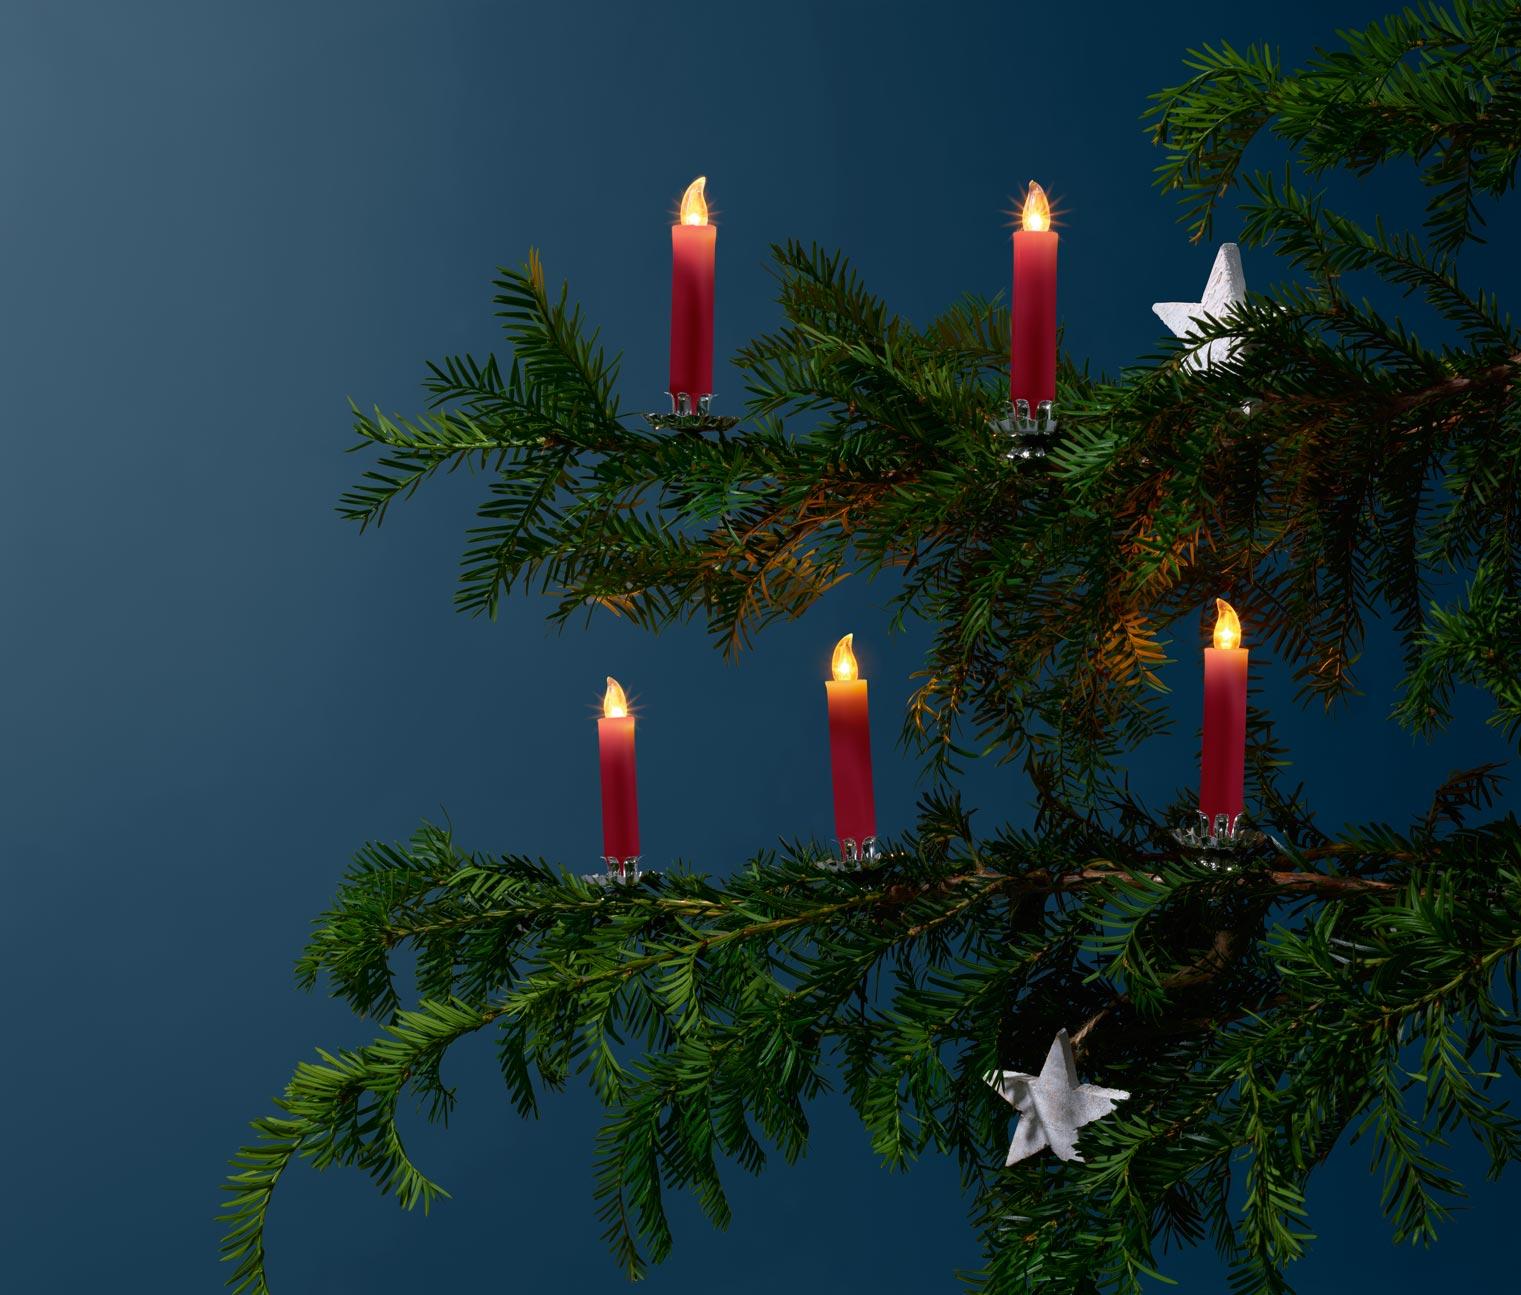 Image of 12 LED-Weihnachtsbaumkerzen